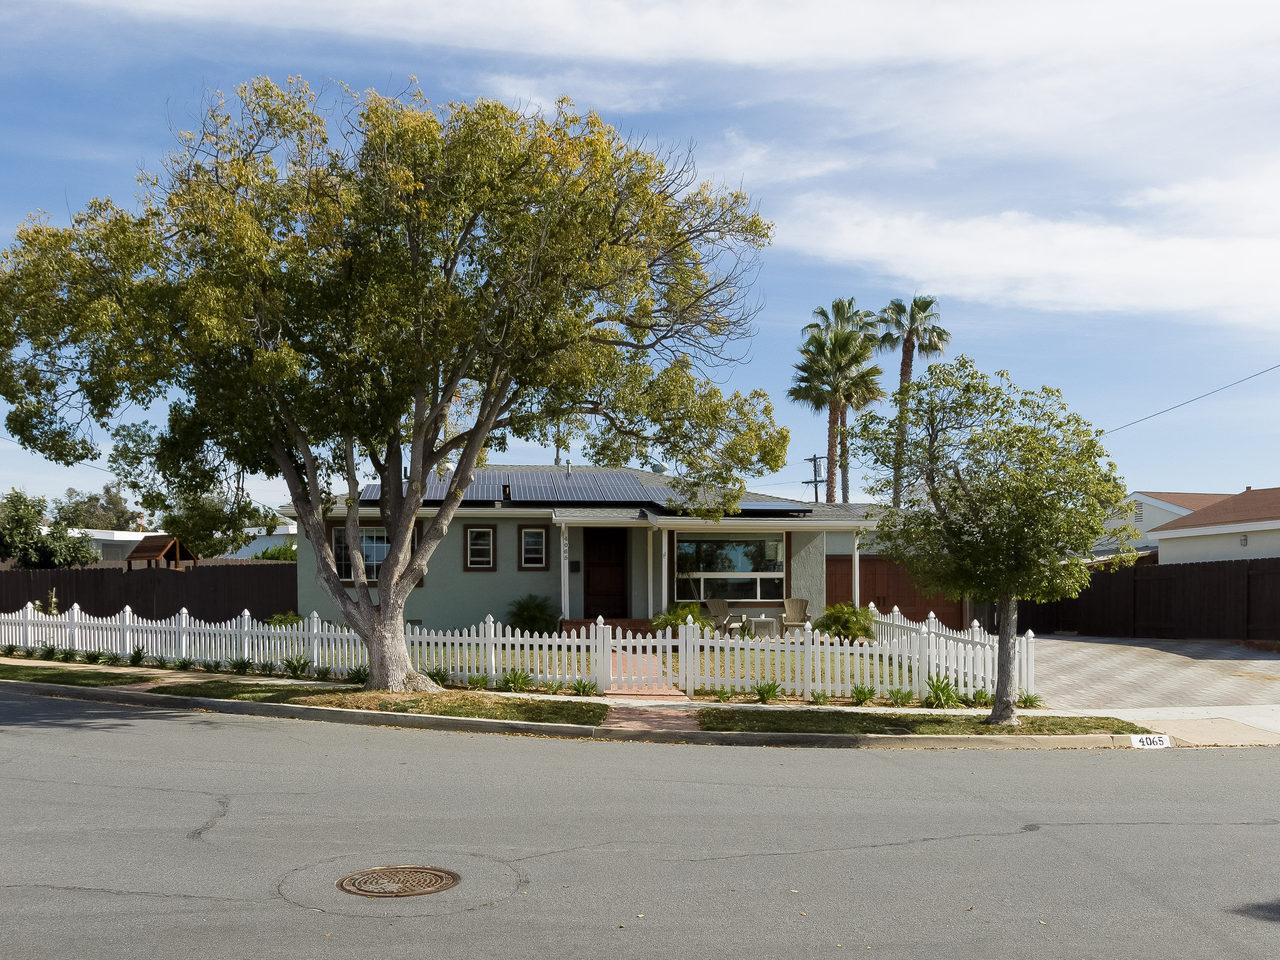 4065 Gros Ventre Ave San Diego-MLS_Size-027-37-4065 Gros Ventre 28 of 29-1280x960-72dpi.jpg